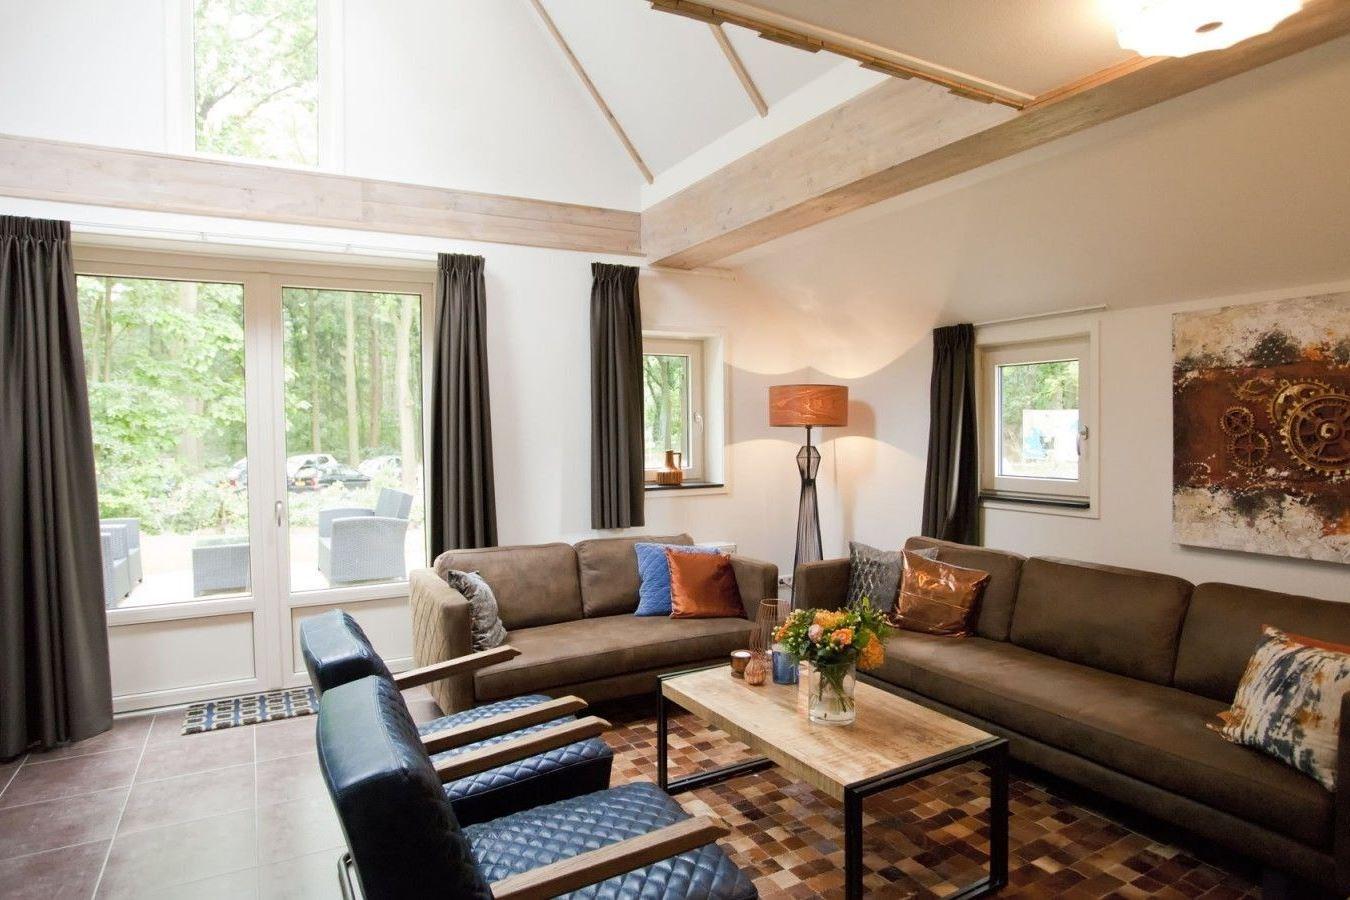 Bekijk foto 2 van Villa Avantage Nouveau